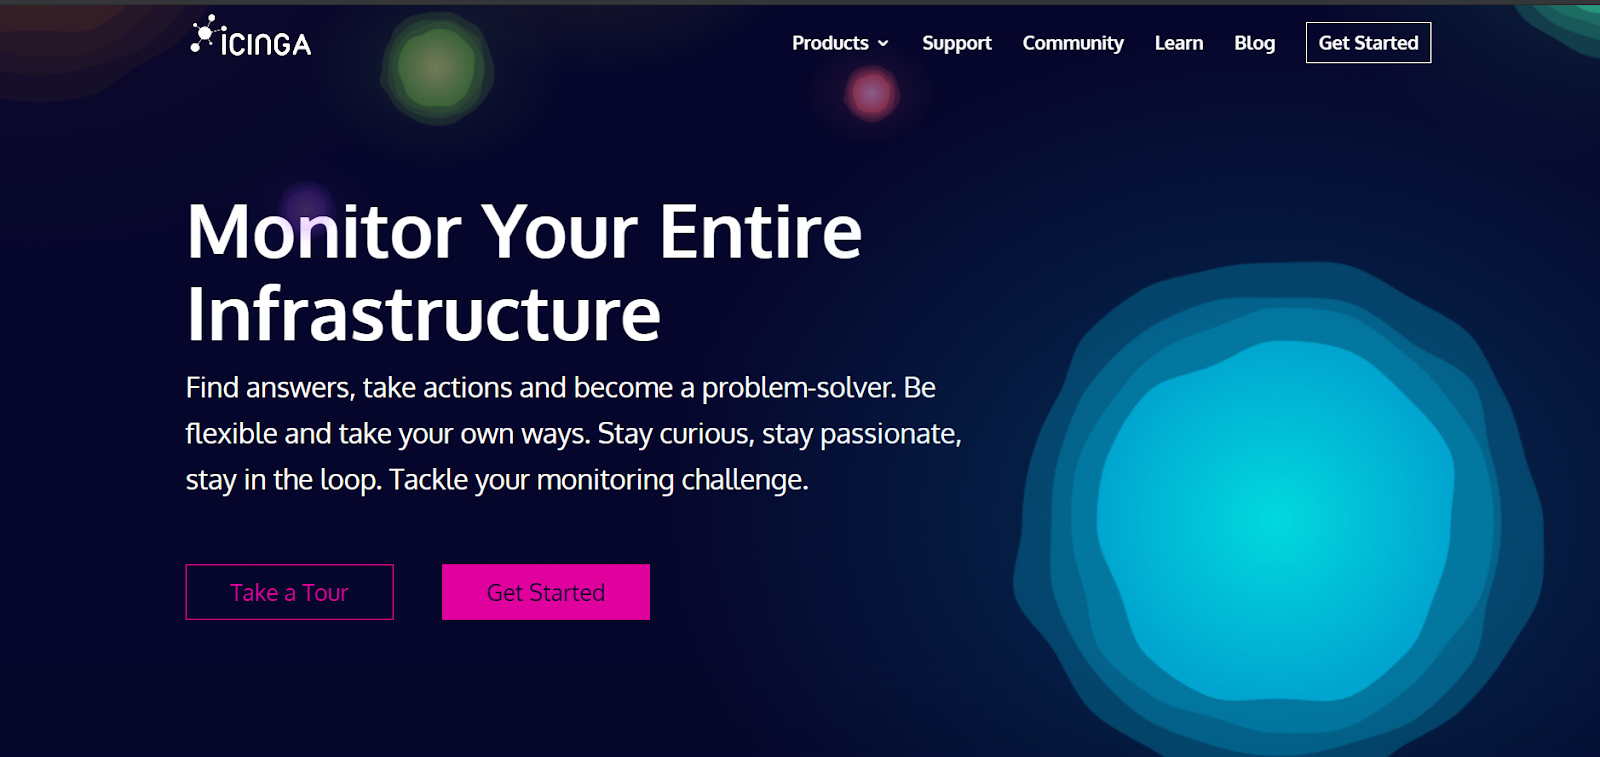 Icinga Server monitoring software